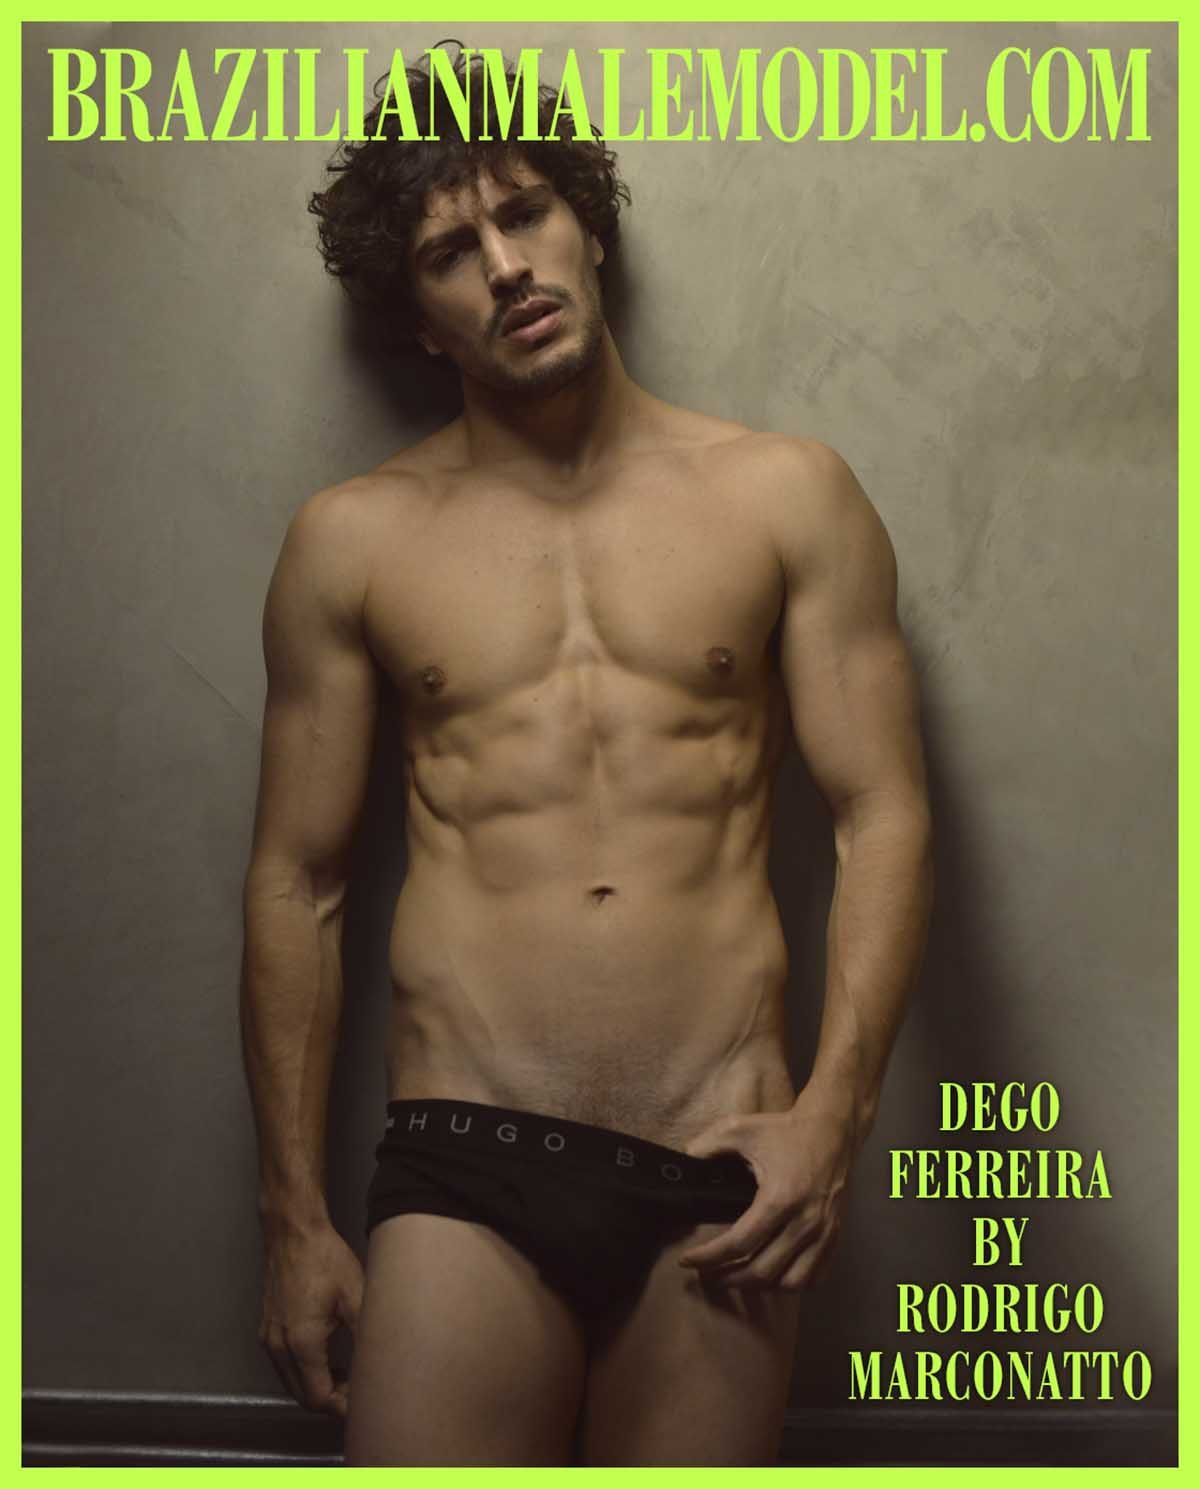 Dego Ferreira by Rodrigo Marconatto